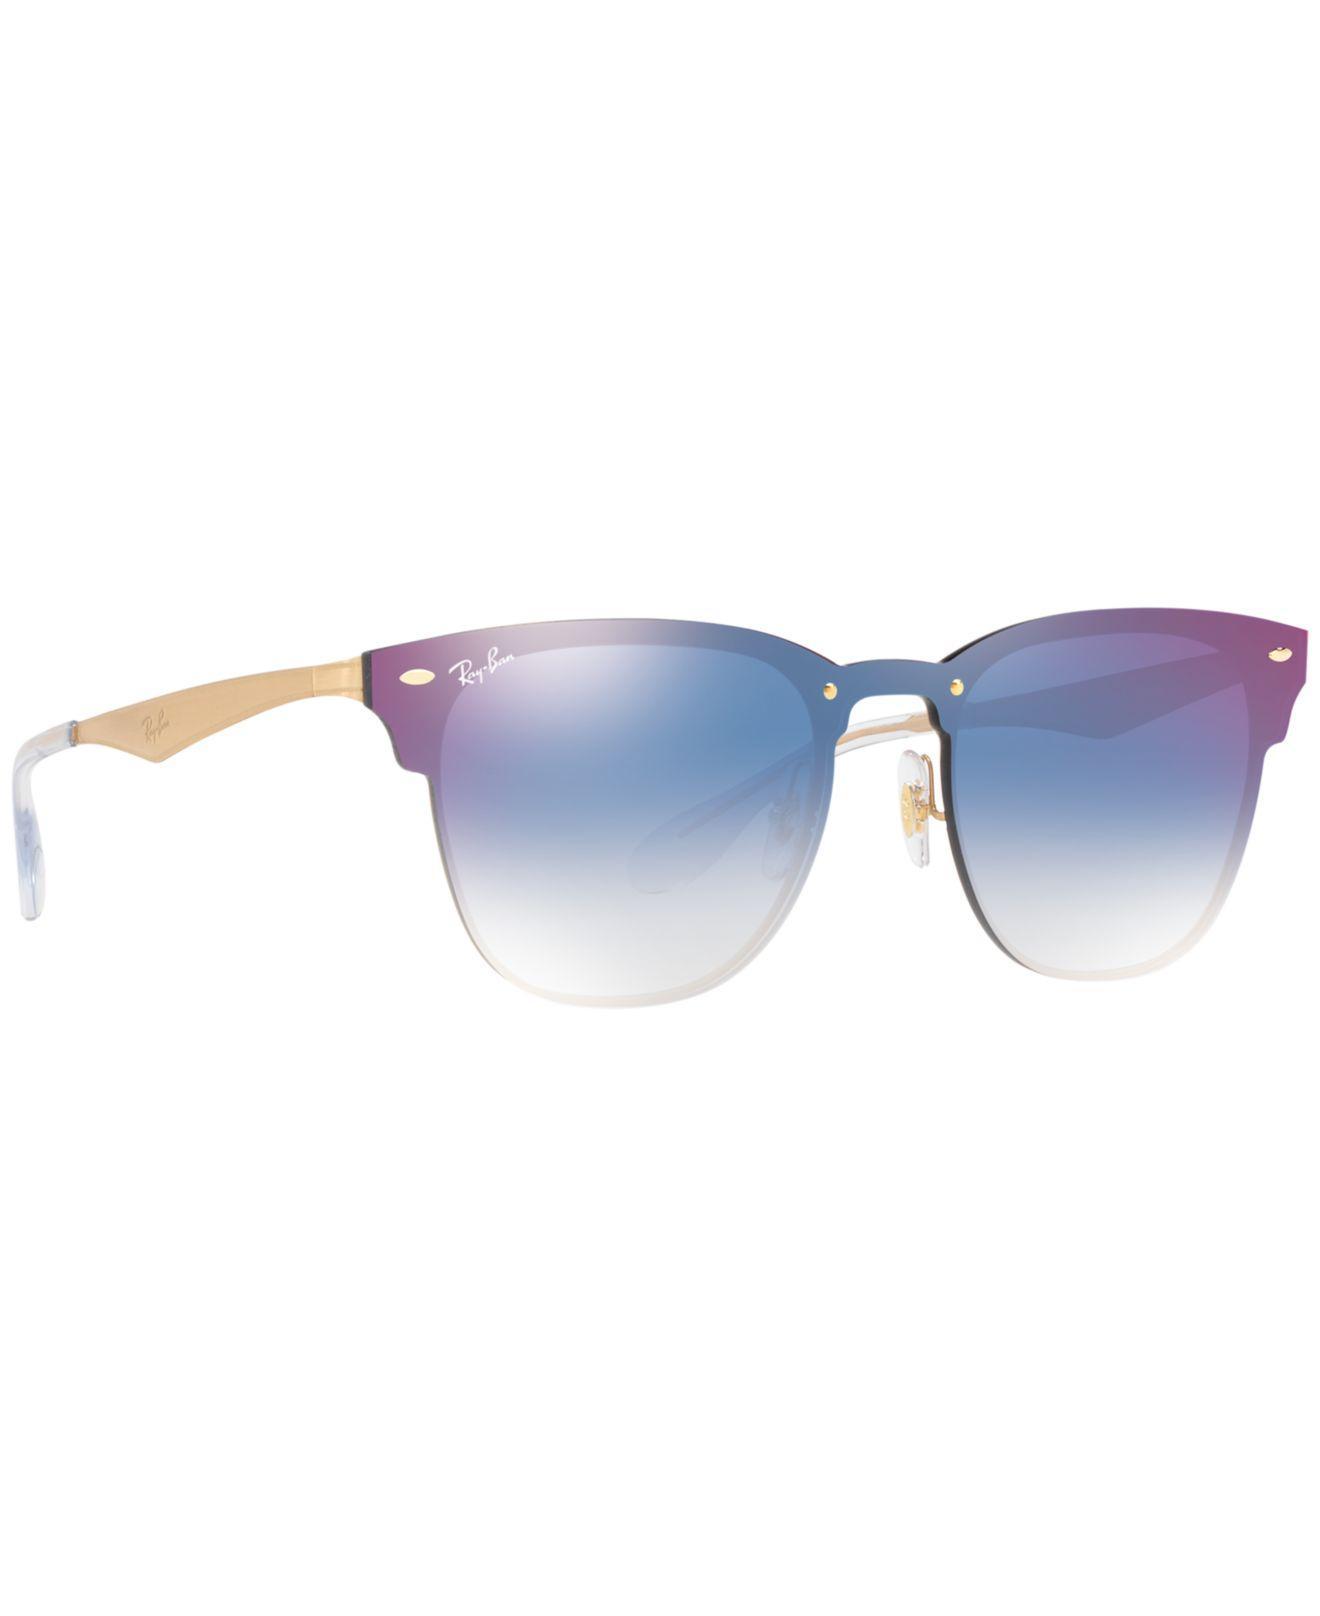 9b57ba16e39c6 Ray-Ban - Blue Rb3576n Unisex Blaze Clubmaster Square Sunglasses for Men -  Lyst. View fullscreen